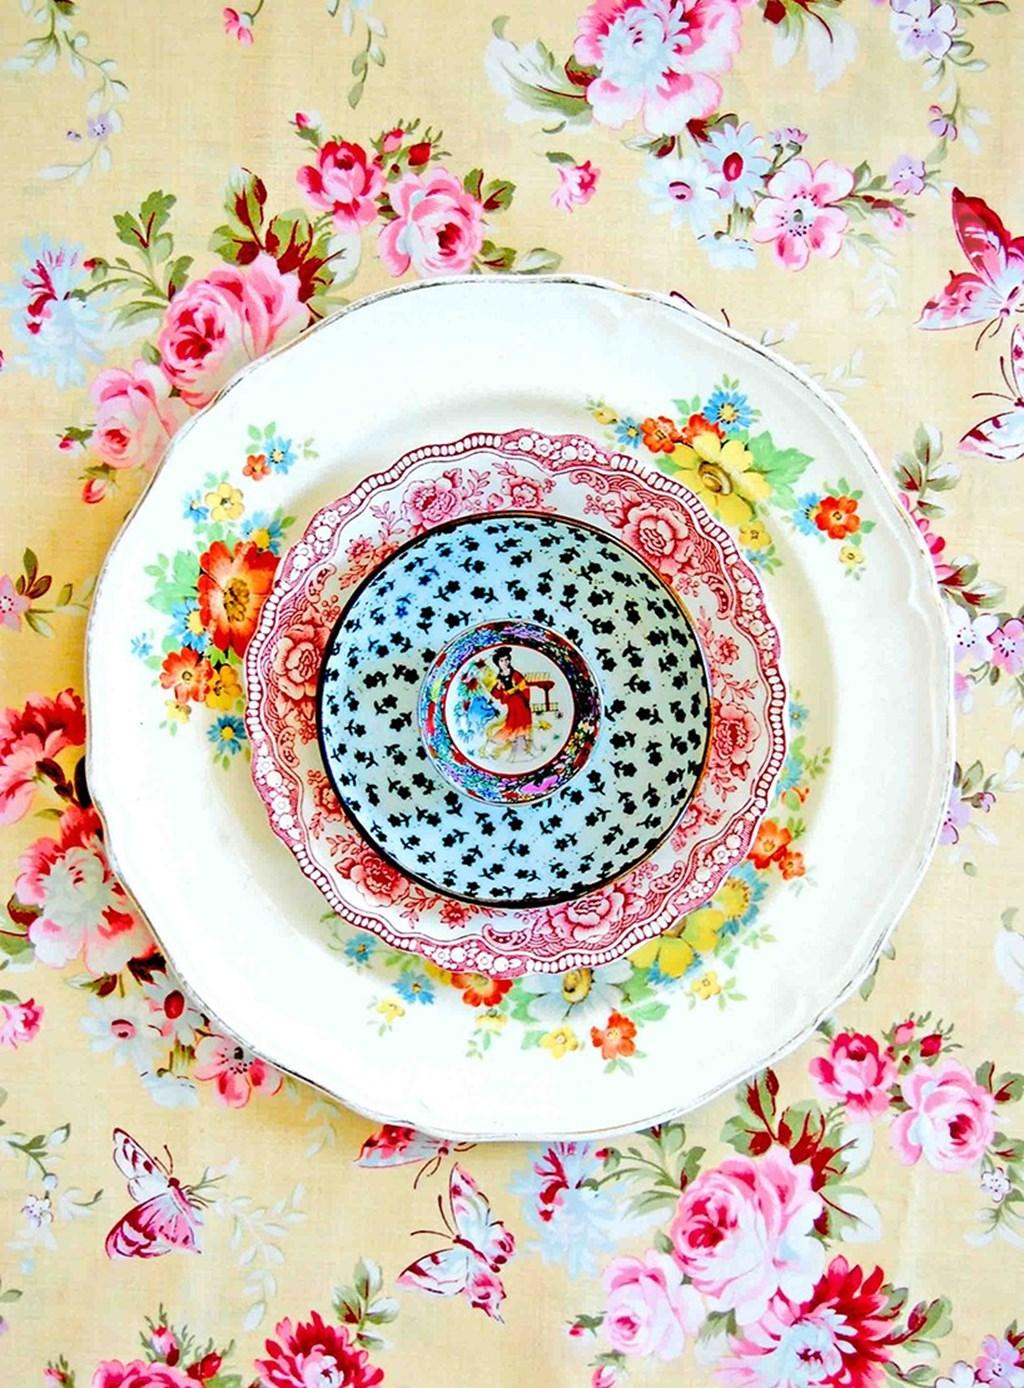 Beautiful Ceramic Plates Designed By Lula Aldunate 3